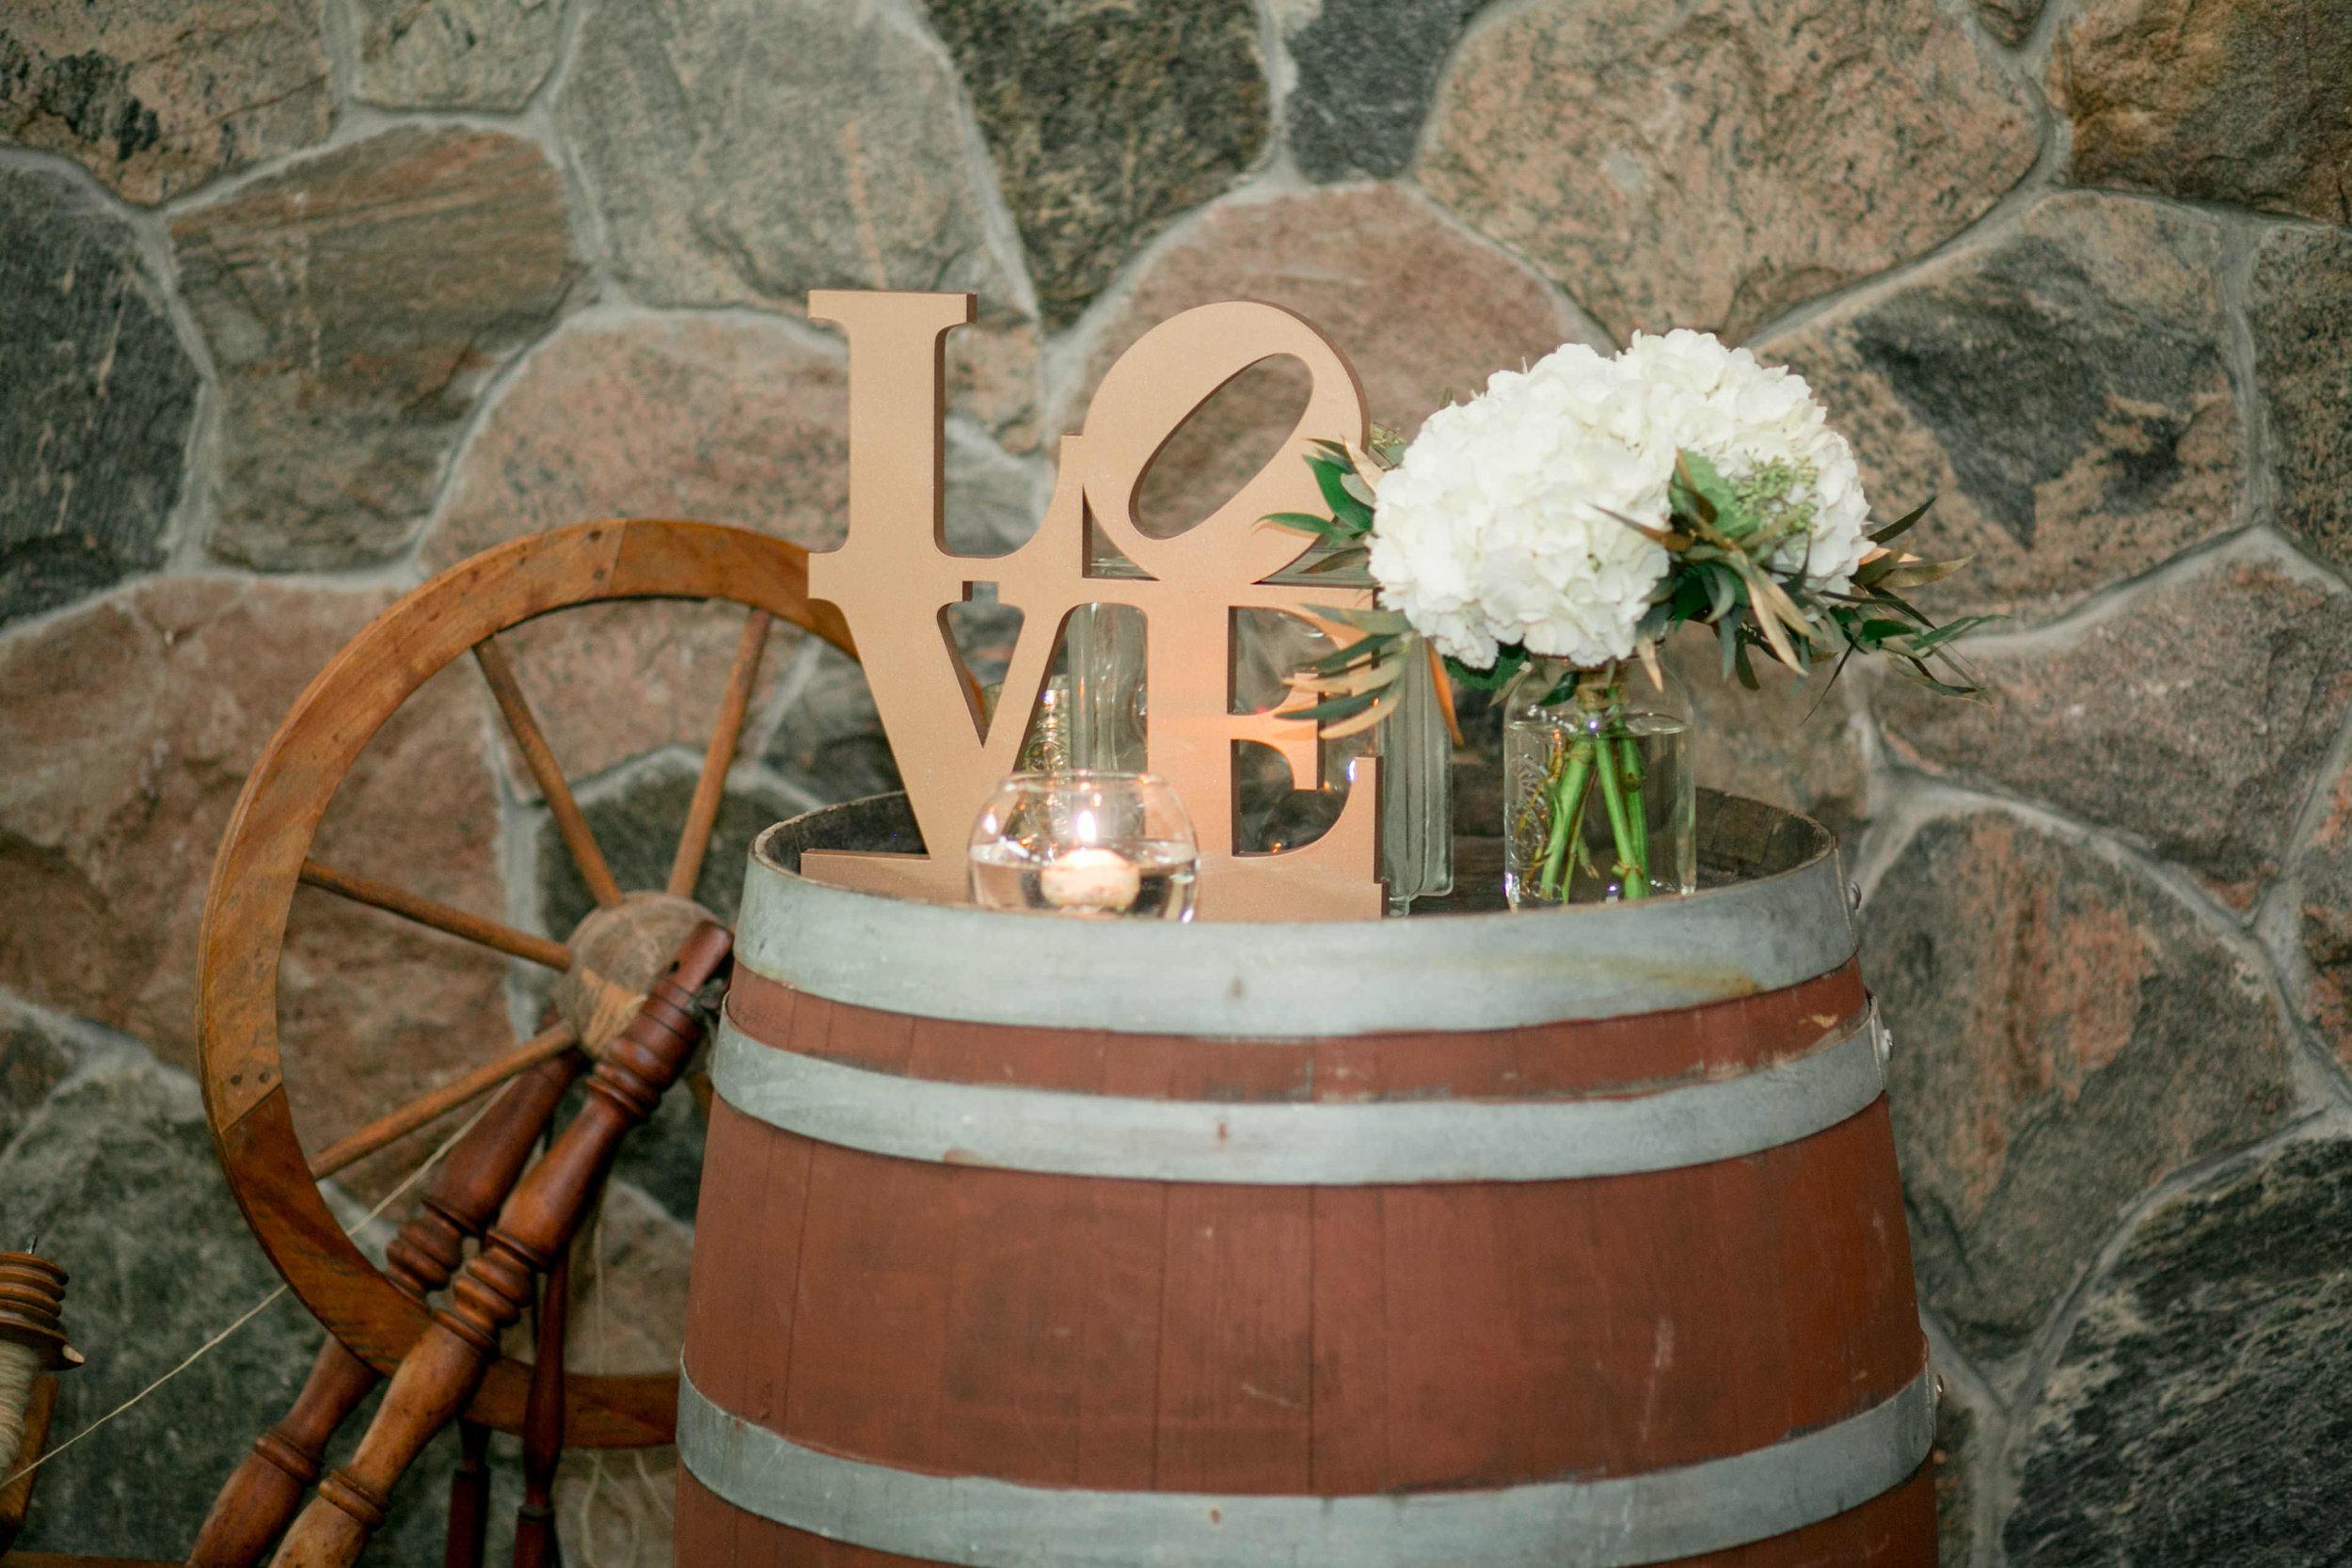 Stefanie___Bernard___Daniel_Ricci_Weddings_High_Res._Finals__404.jpg